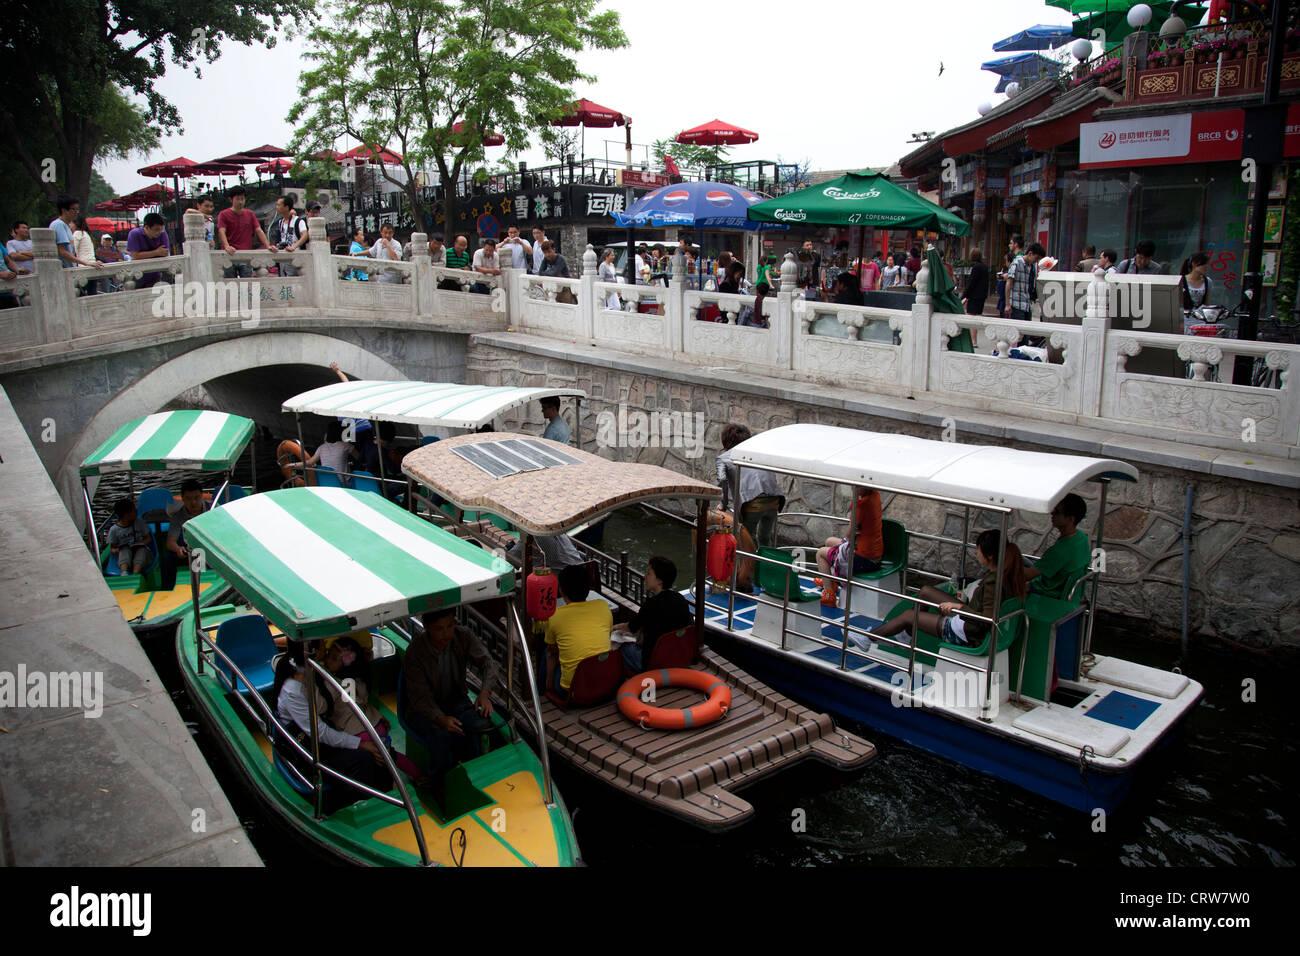 Small boats create a waterway traffic jam on Shichahai lake at Yinding bridge Beijing, China. - Stock Image